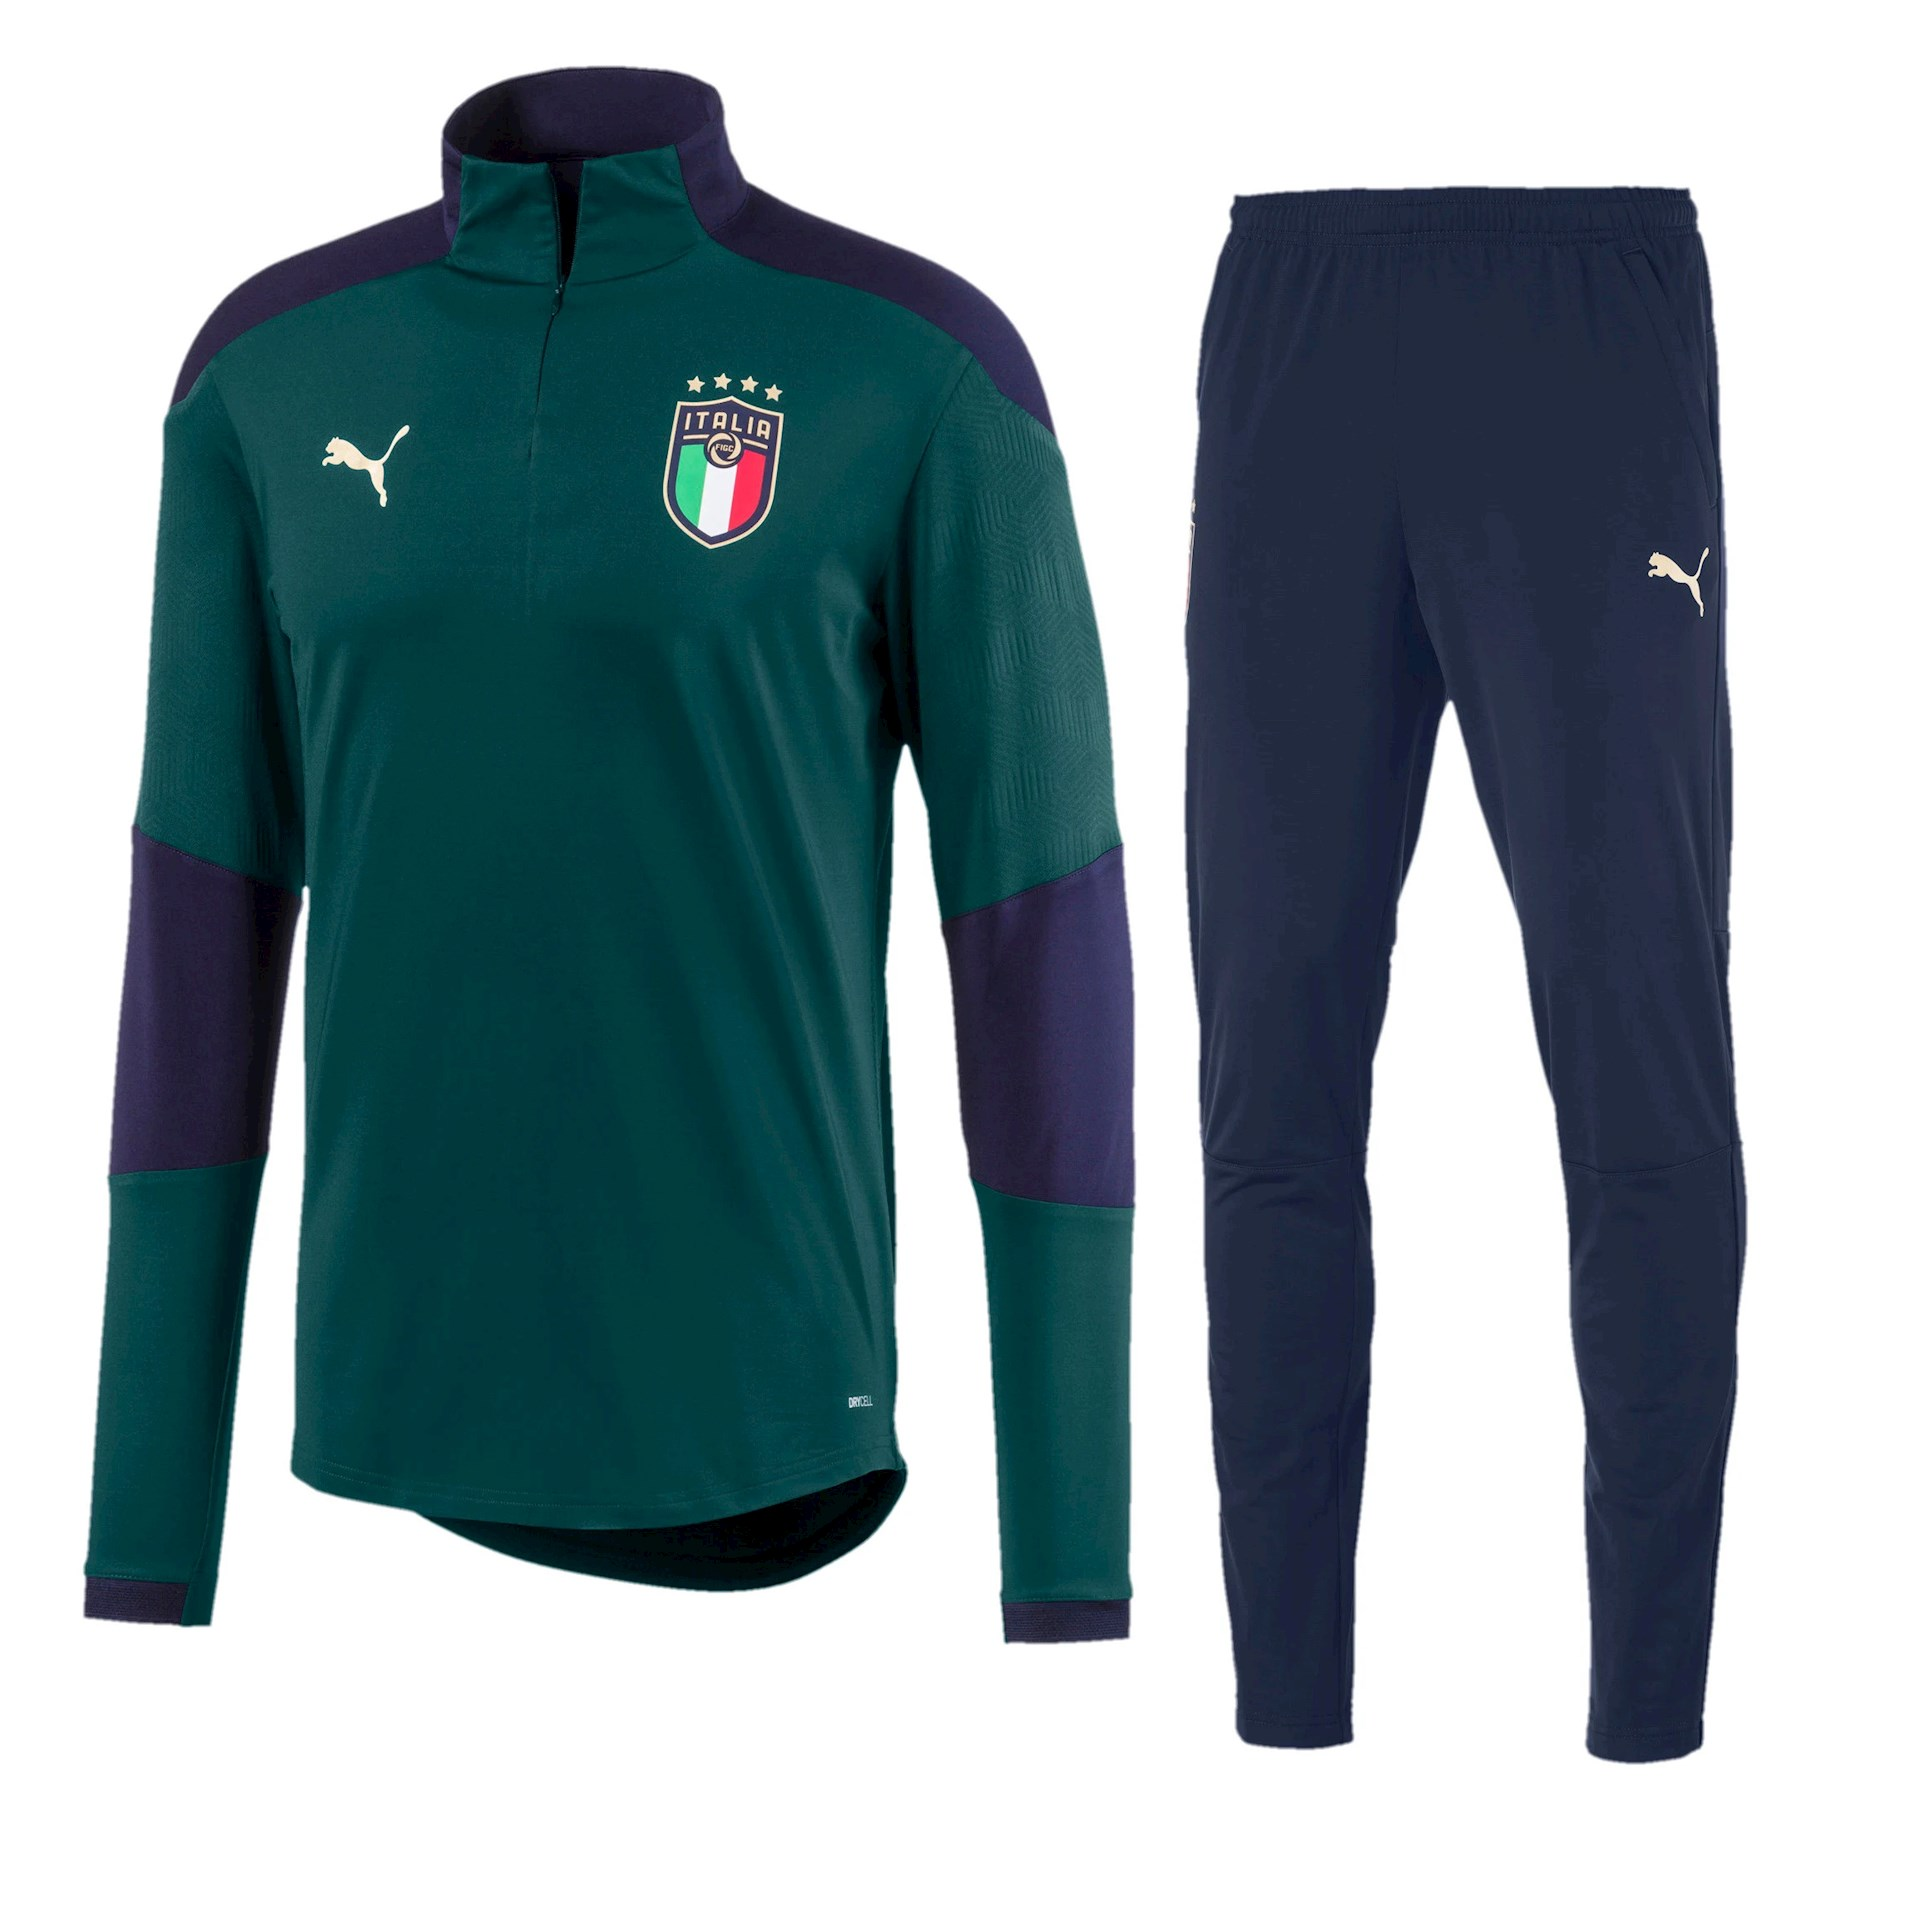 Italie Survetement - Maillots-Football.com